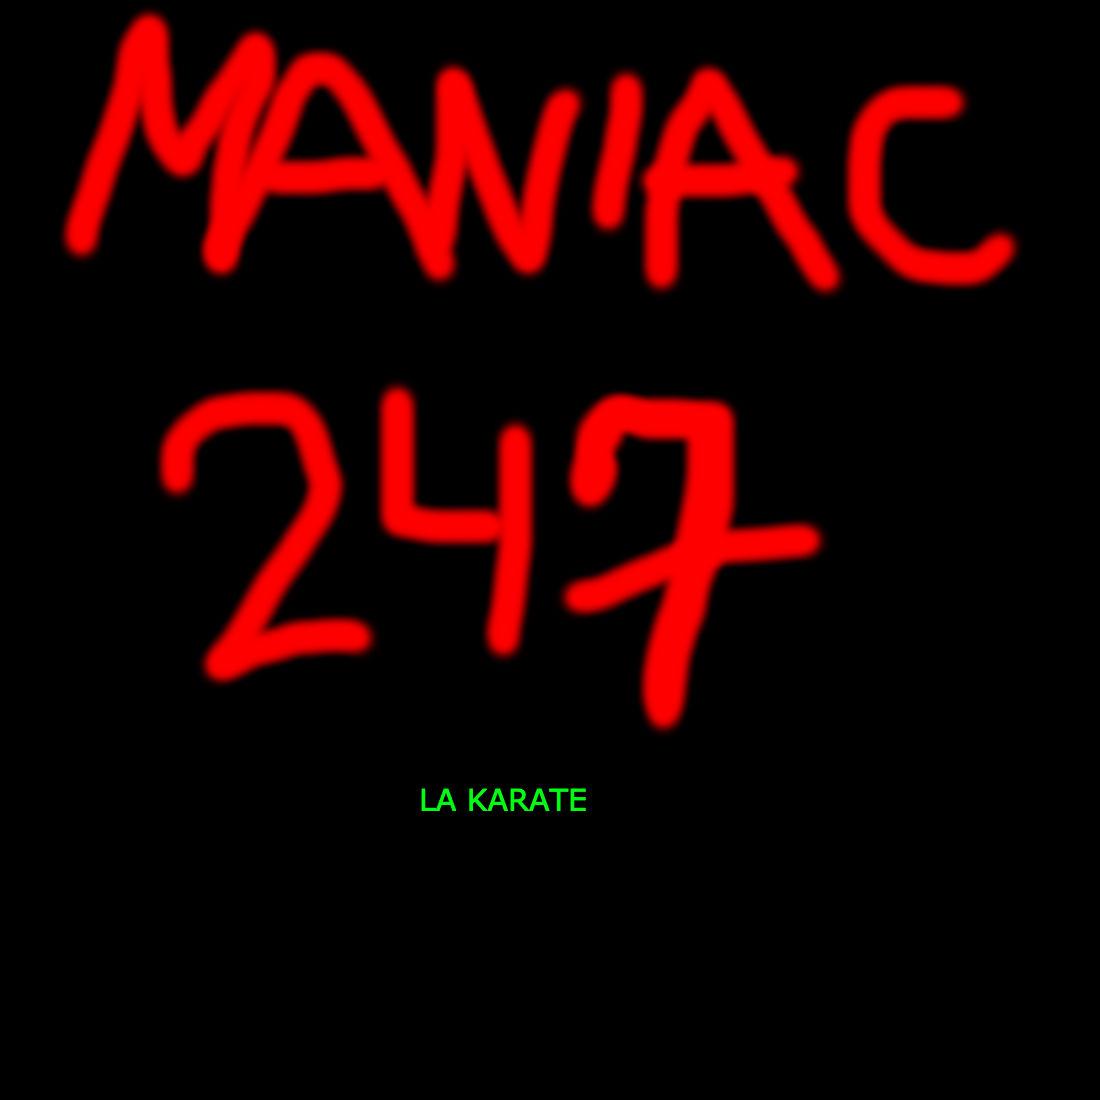 Upcoming: Maniac247 - LA Karate